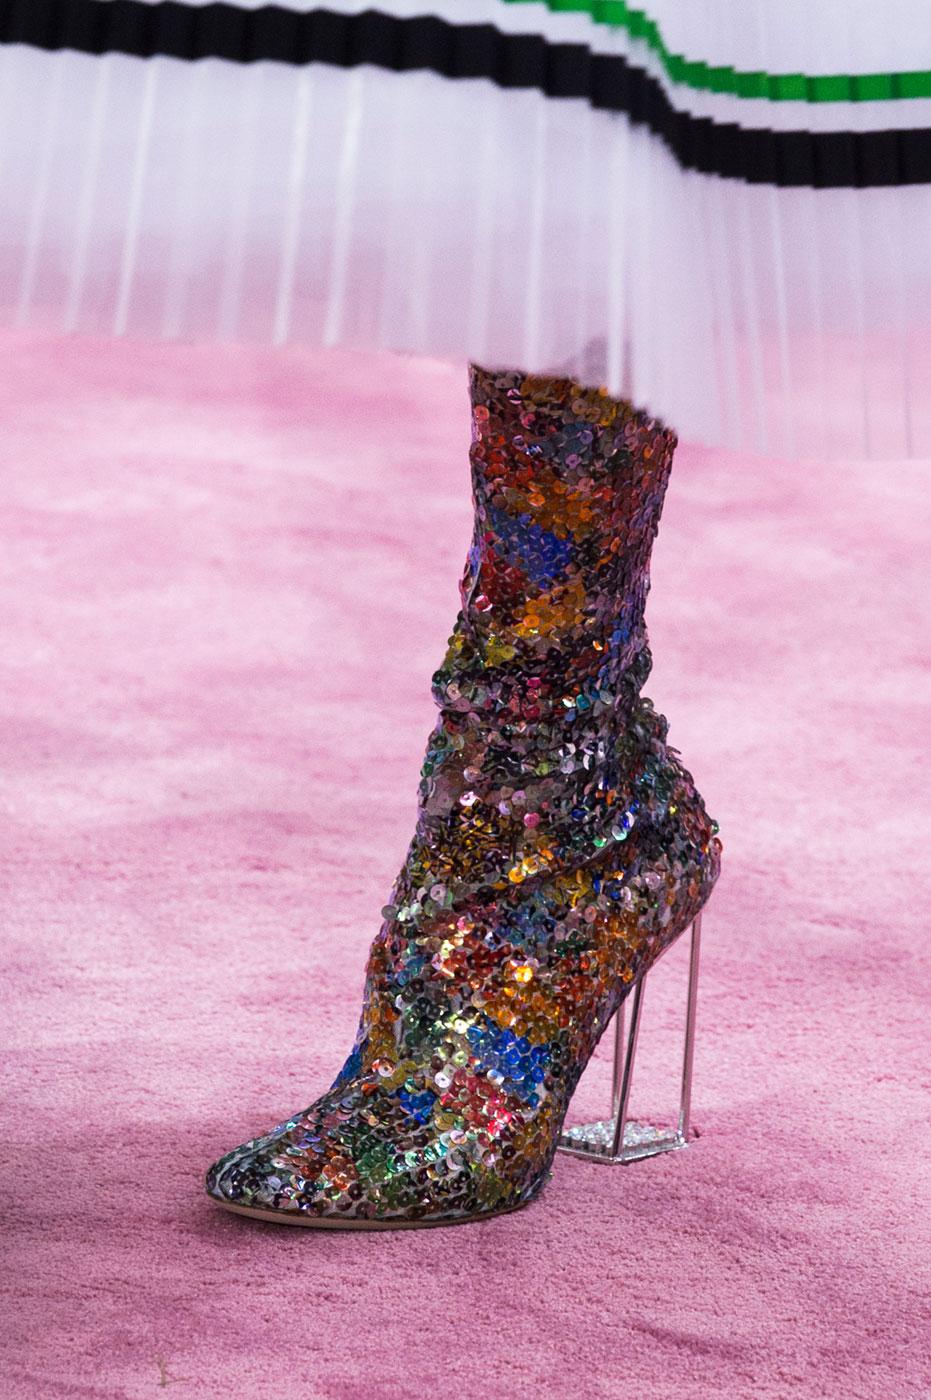 Christian-Dior-fashion-runway-show-close-ups-haute-couture-paris-spring-summer-2015-the-impression-205